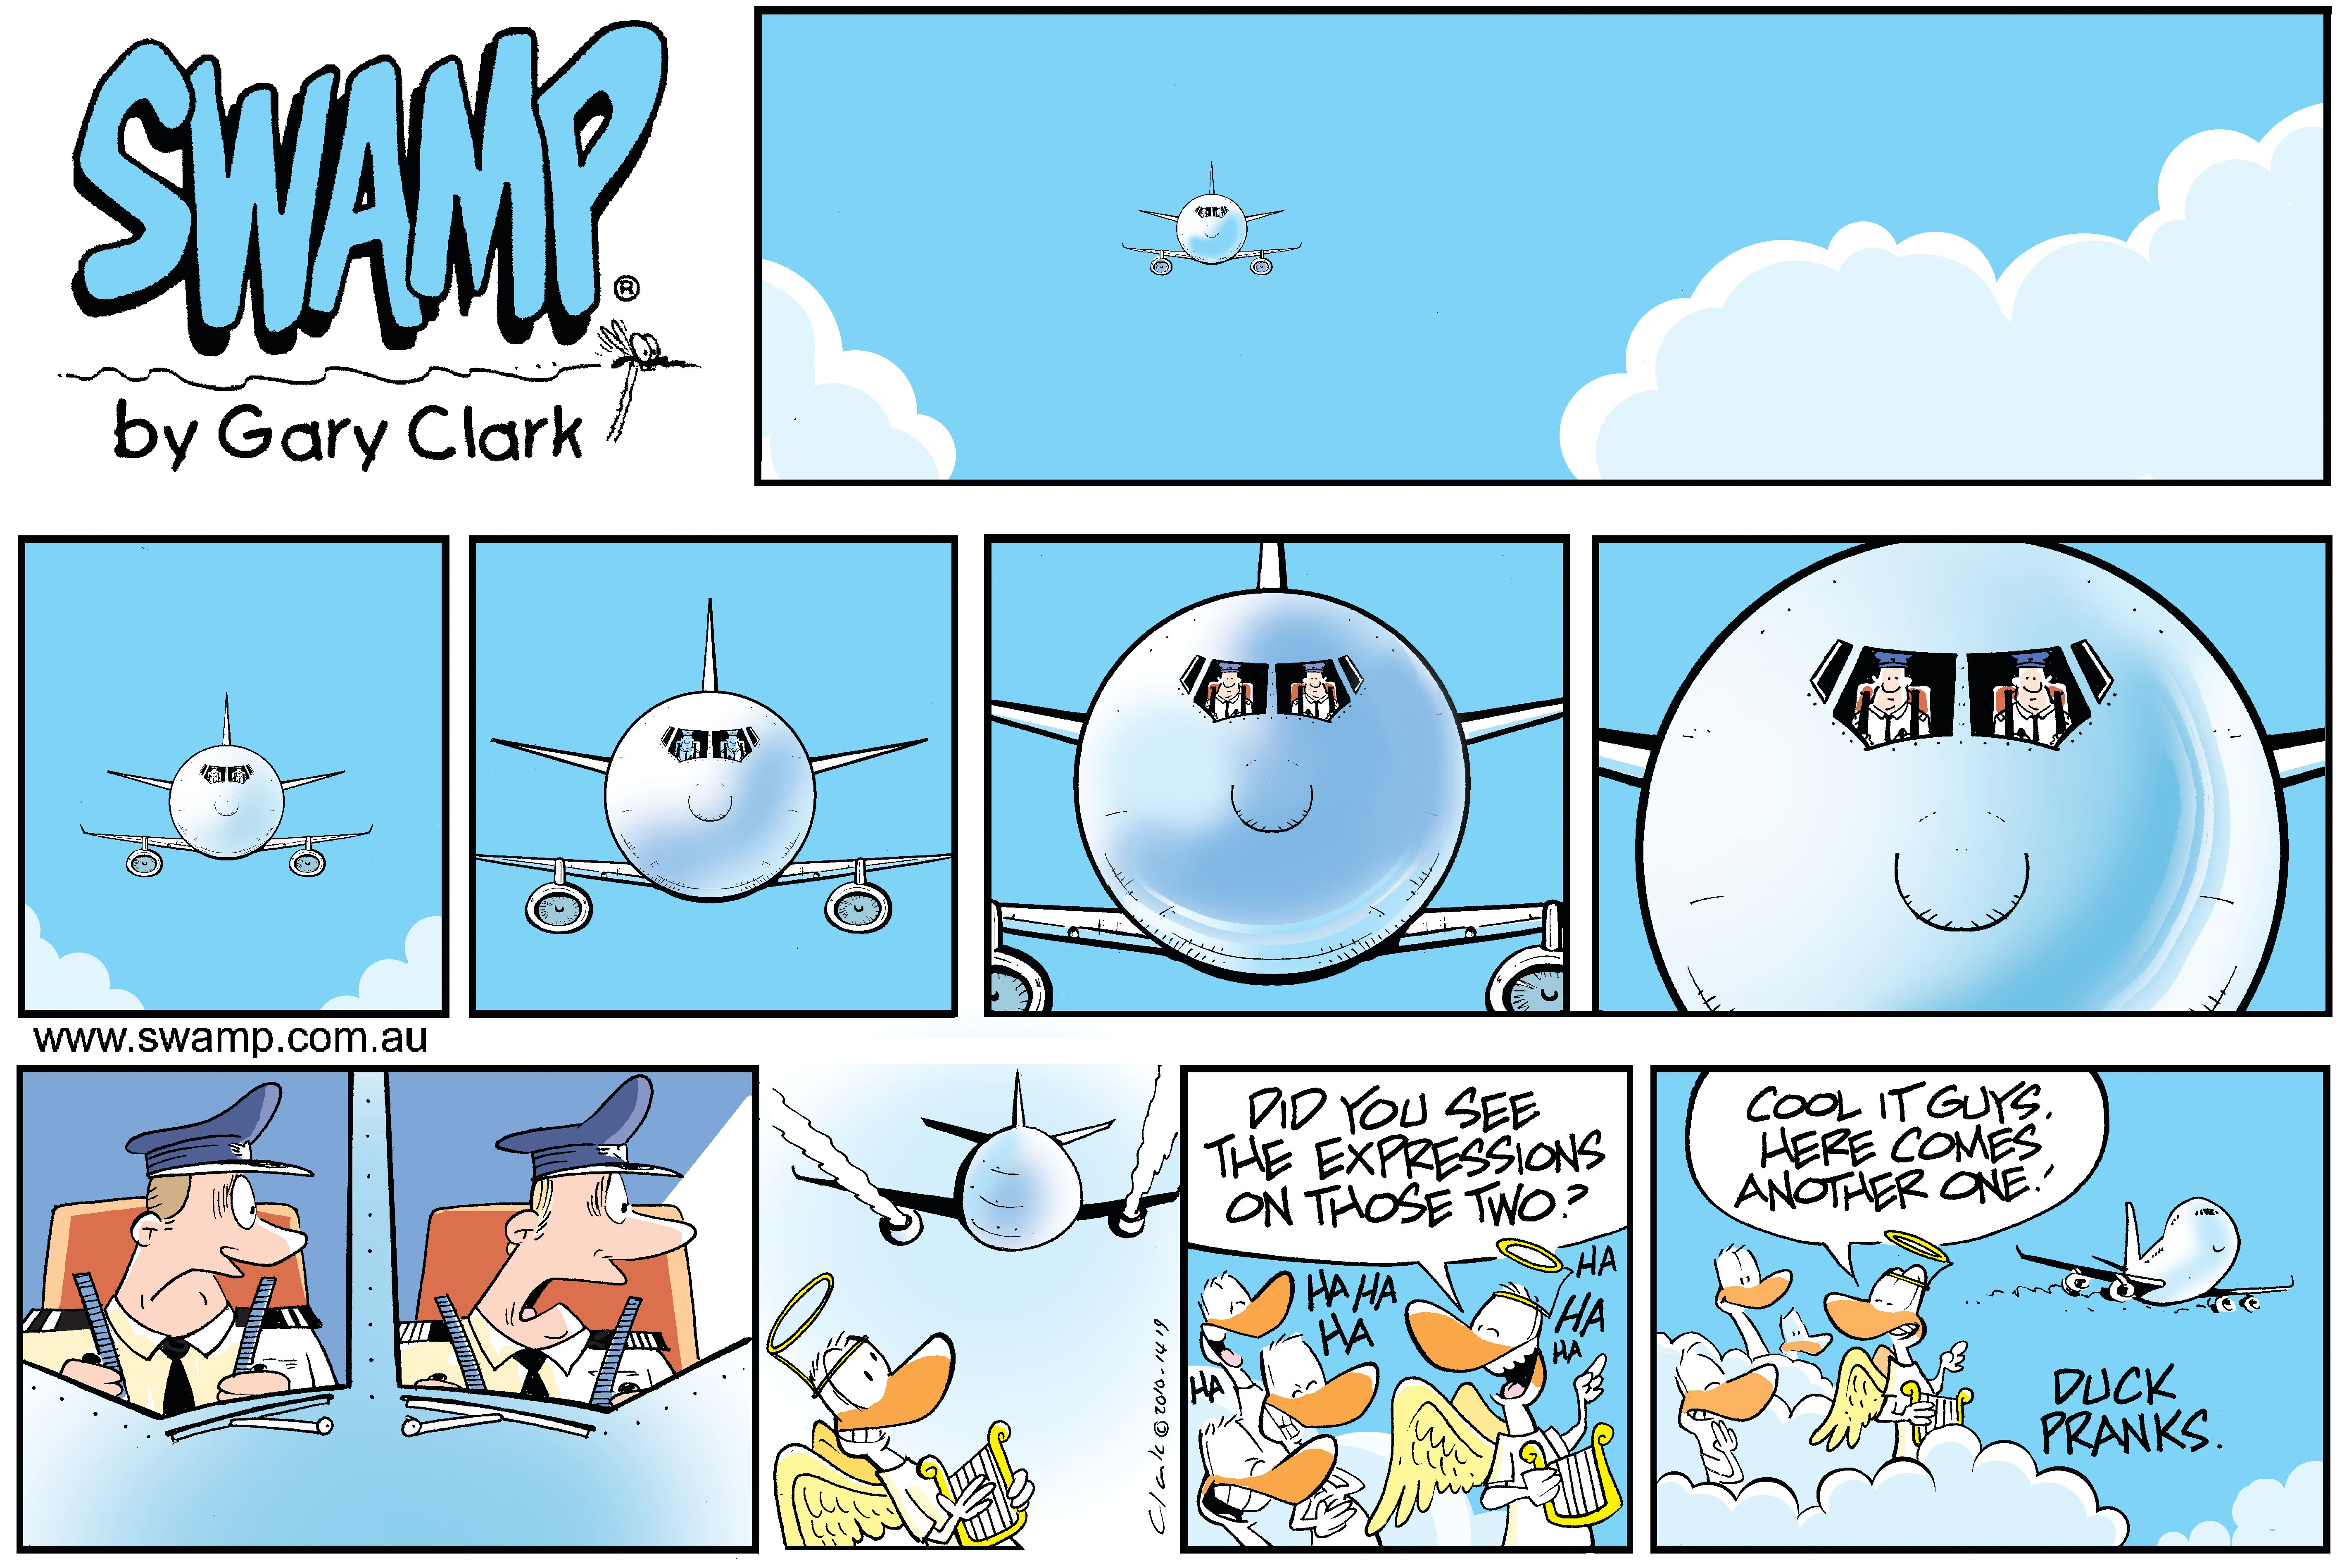 Ducks Prank Airline Pilots Comic